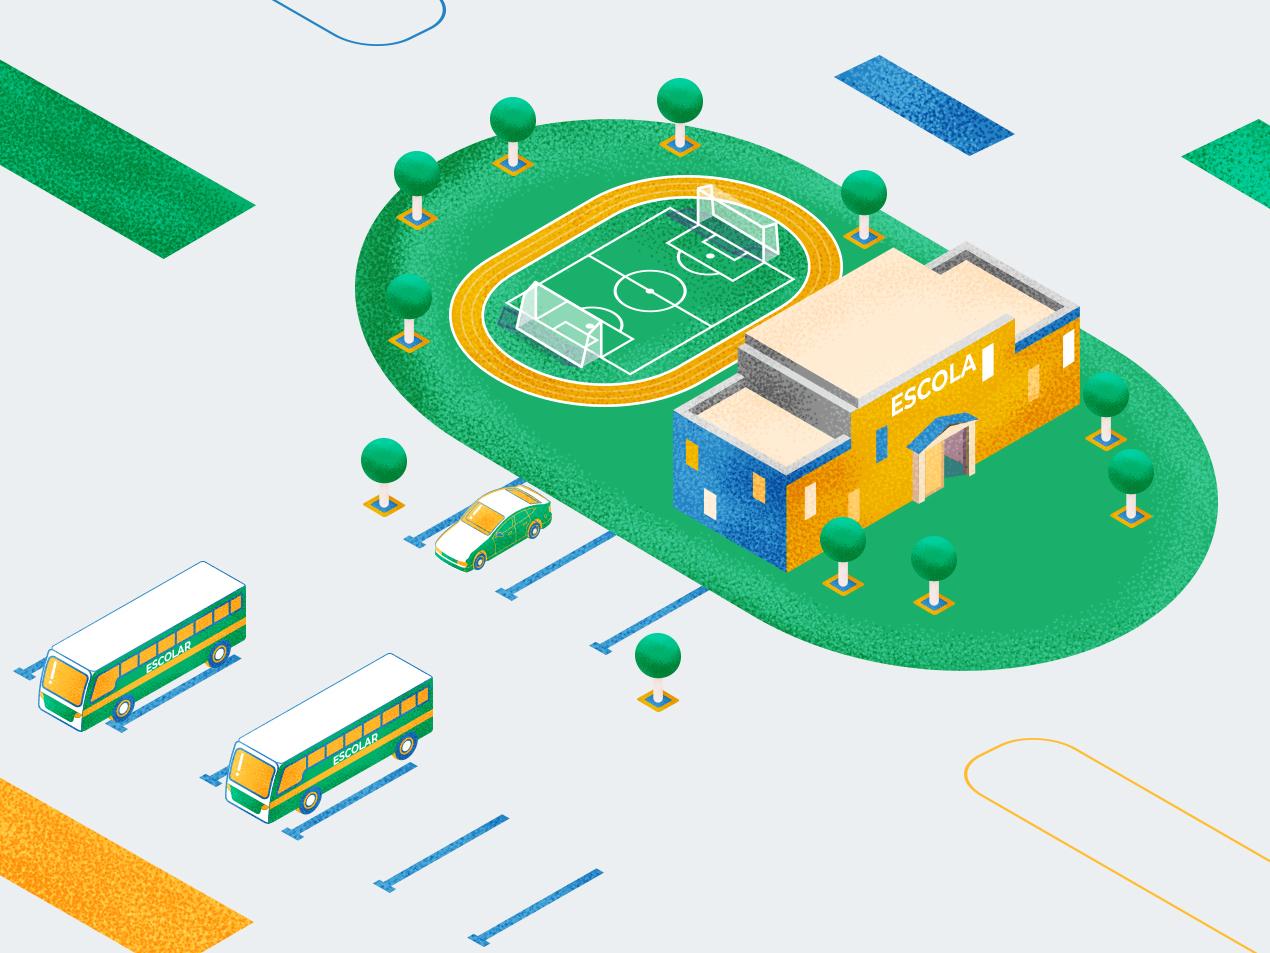 school vector city design motion car illustration abstact flat illustration charactedesign animation 2d animation art school